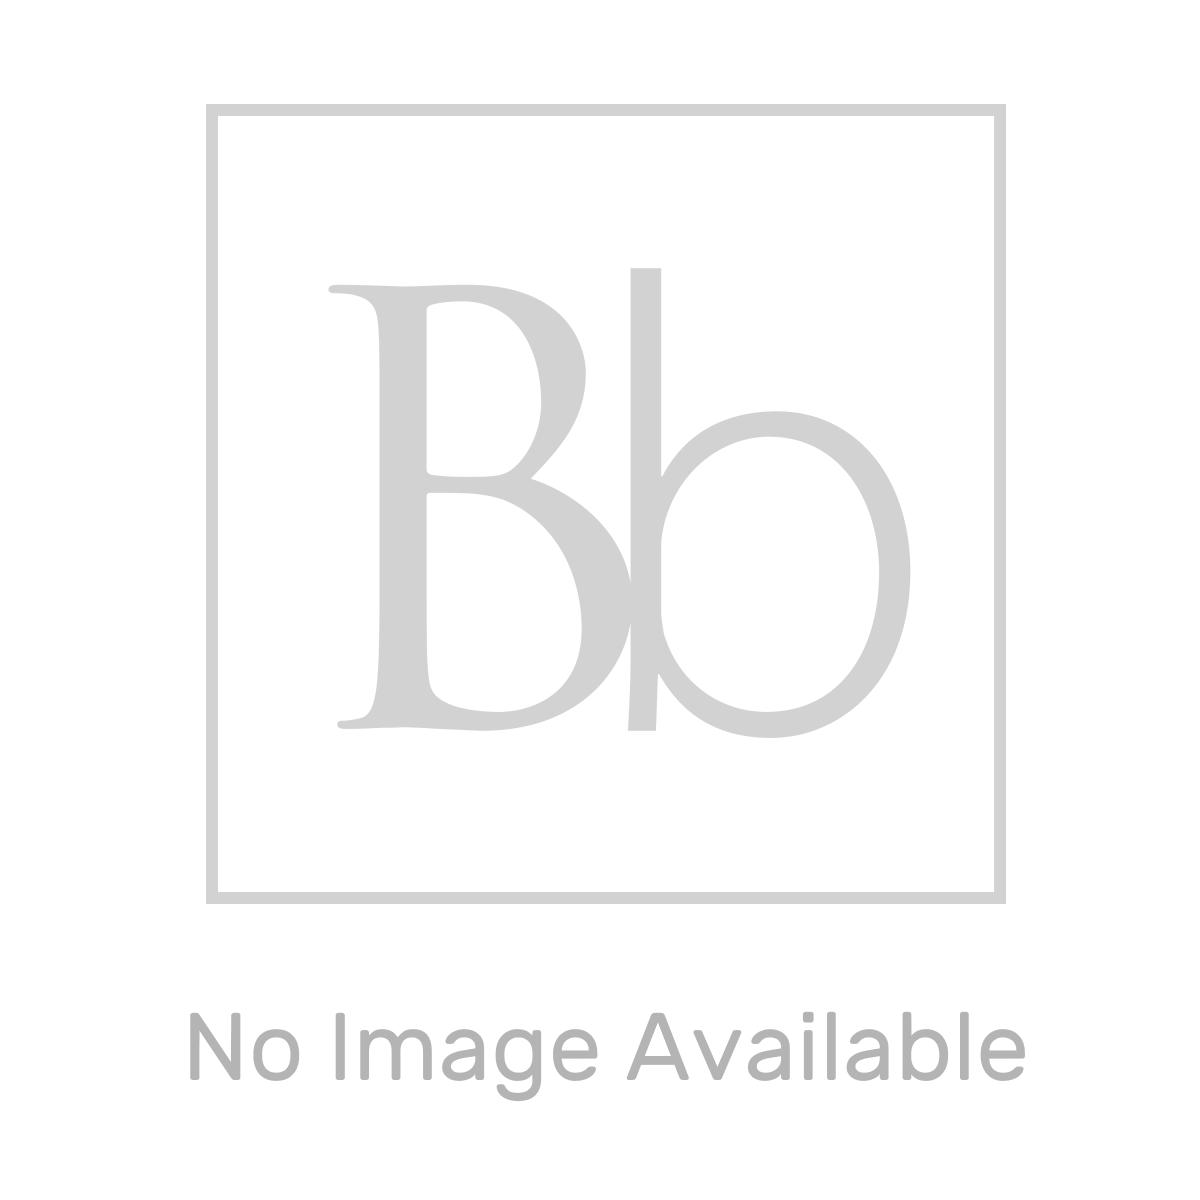 RAK Surface Mid Grey Lappato Tile 600 x 1200mm Lifestyle